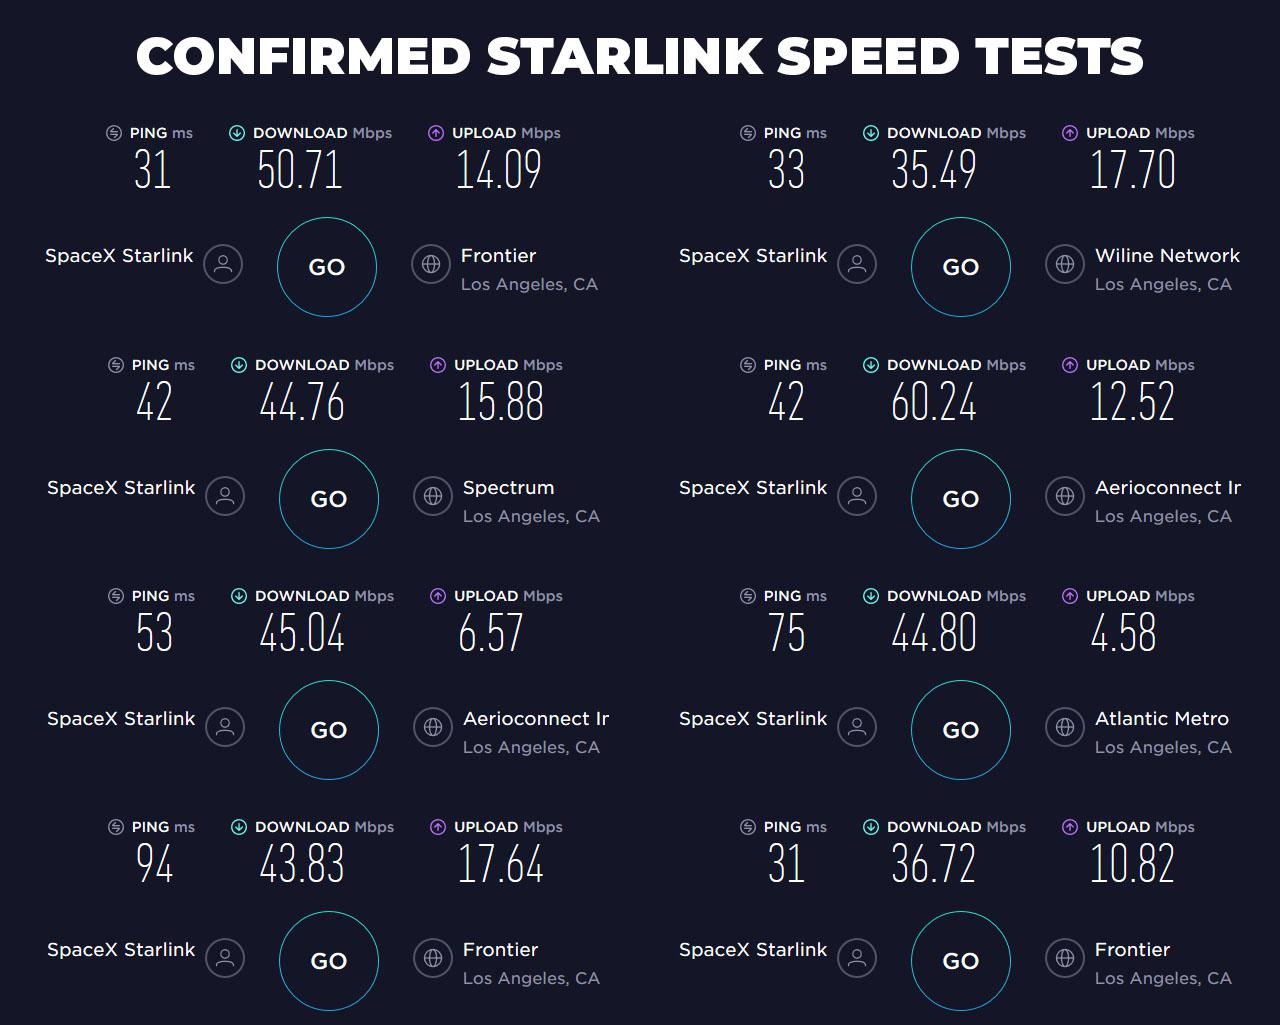 starlink tests انتشار نتایج تستهای اینترنت ماهوارهای استارلینک؛ خبری از سرعت گیگابیتی نیست اخبار IT